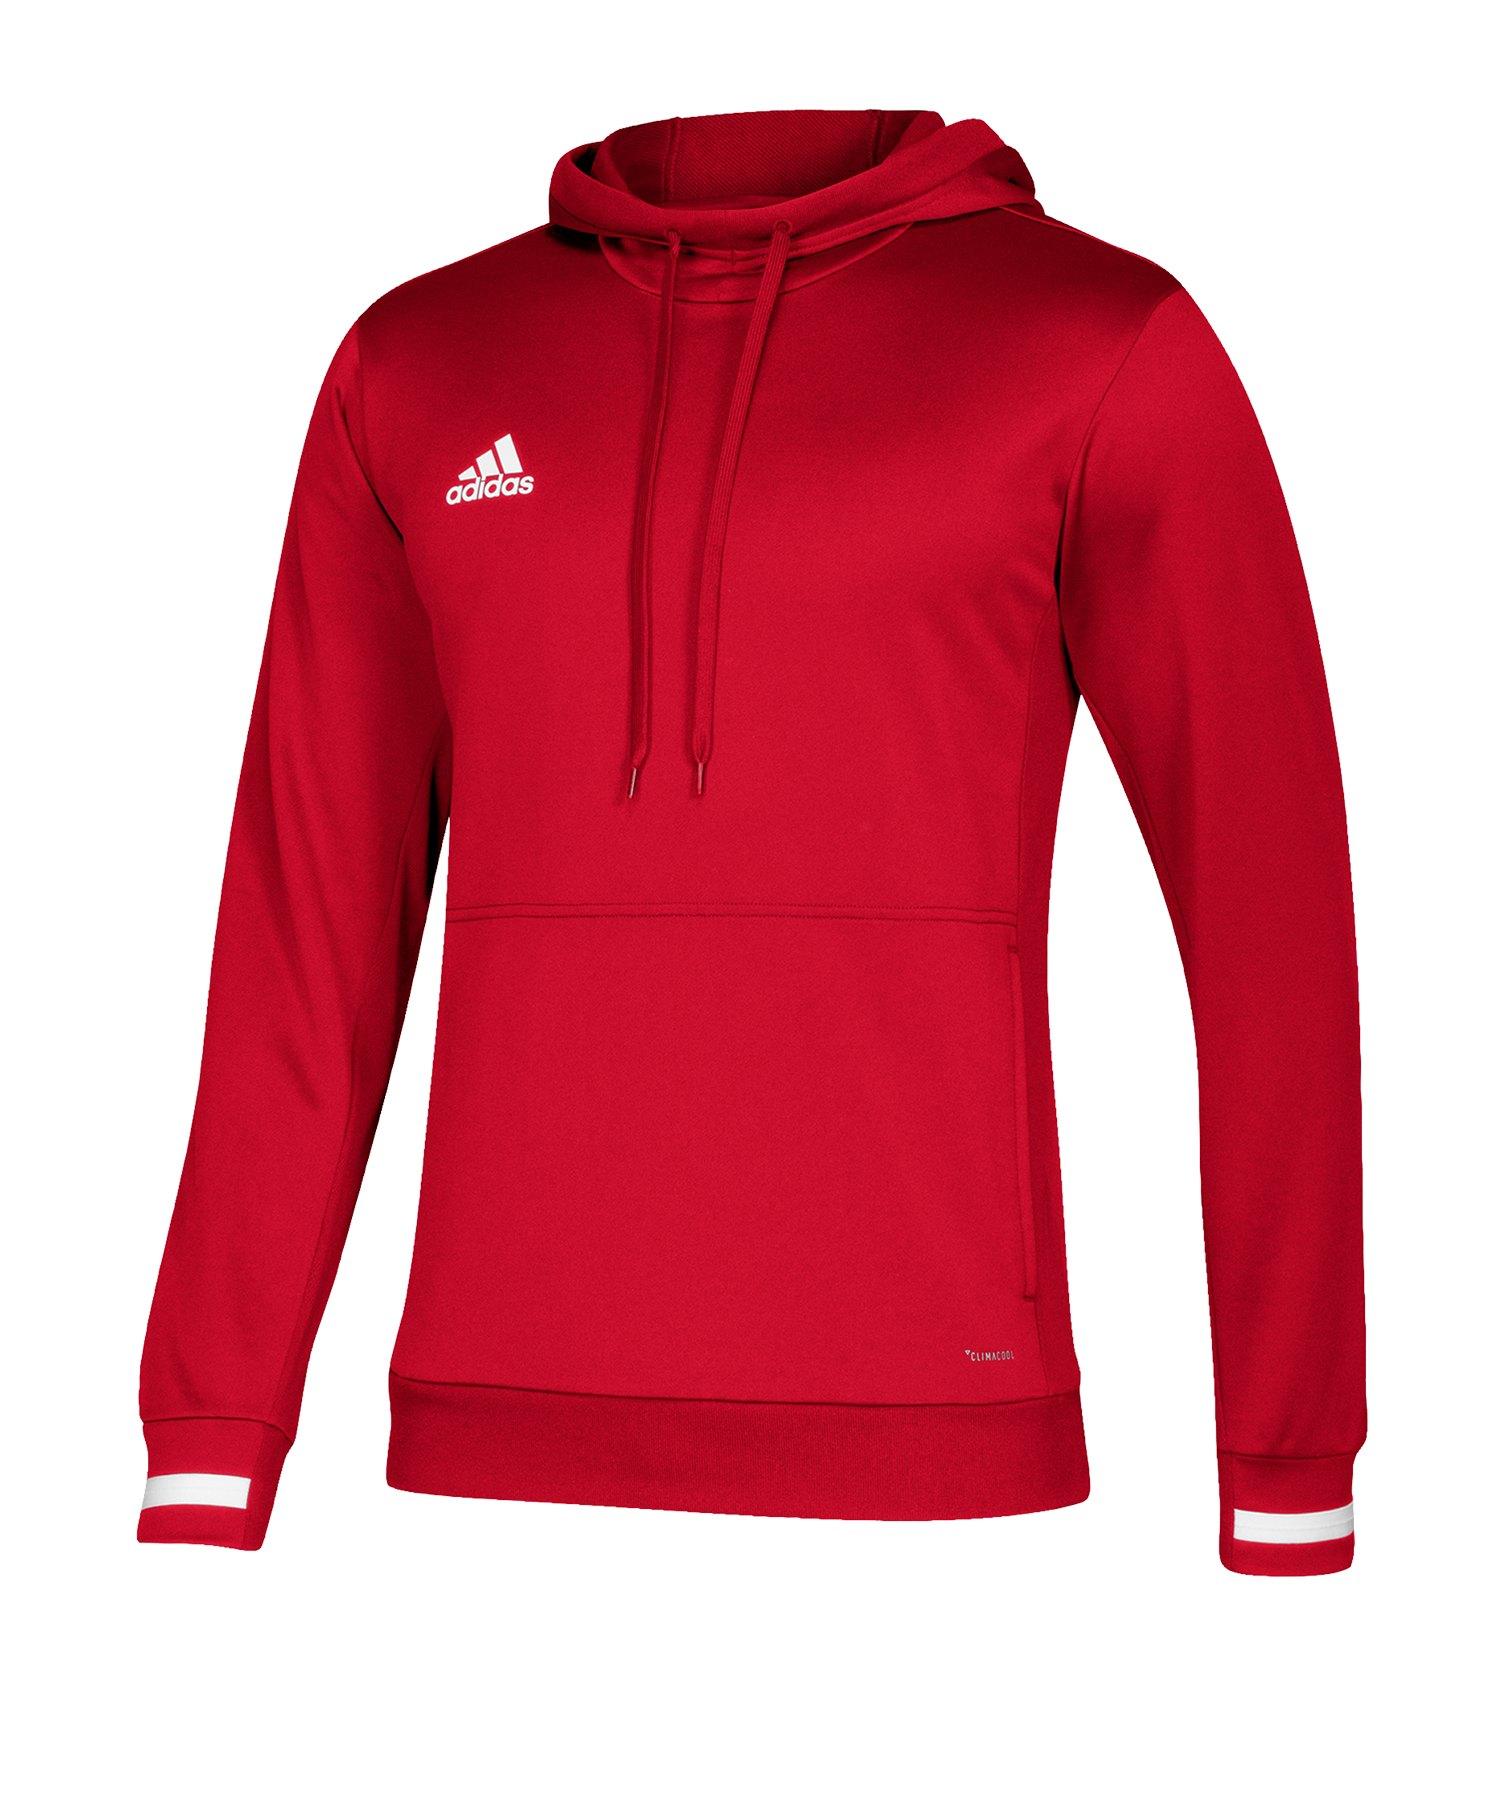 adidas Team 19 Kapuzensweatshirt Rot Weiss - rot